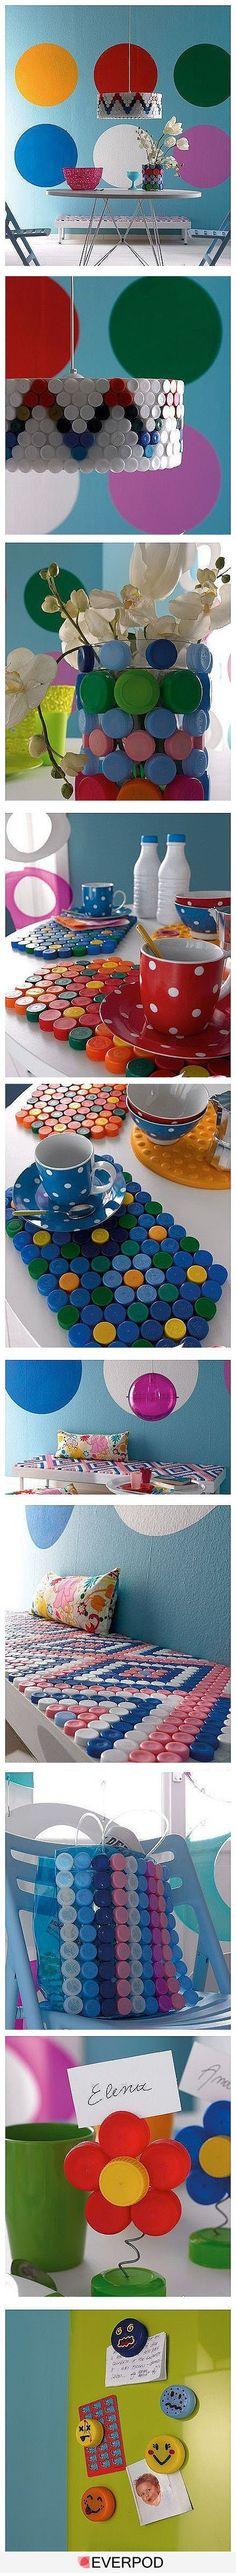 salvamanteles-tapones-plastico.jpg 440×4,798 pixels